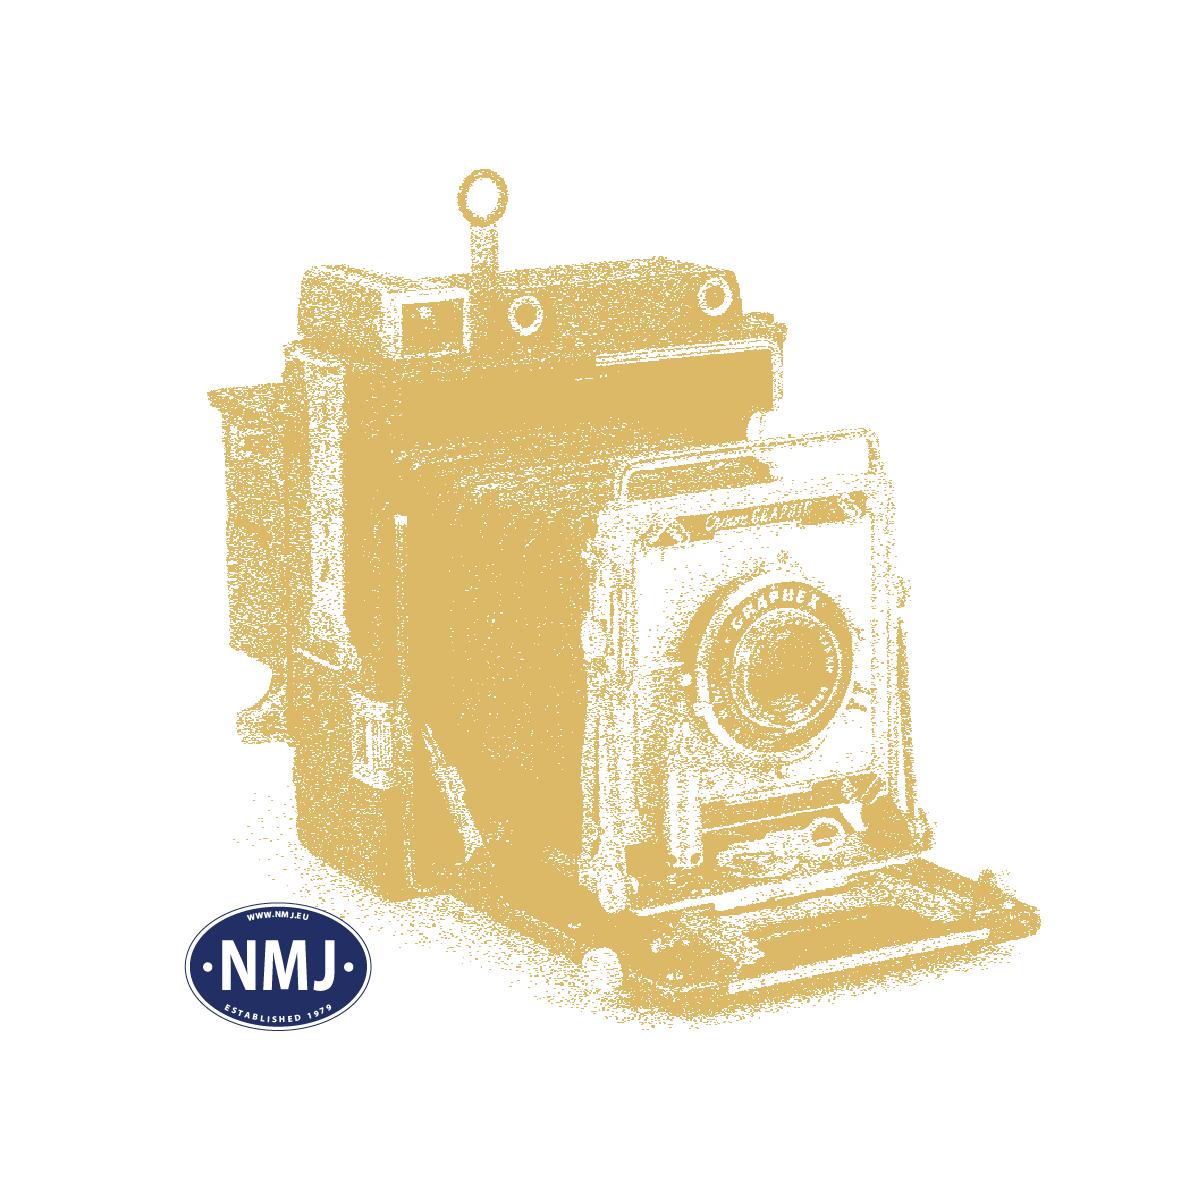 NMJT106.505 - NMJ Topline NSB B3-6 25538